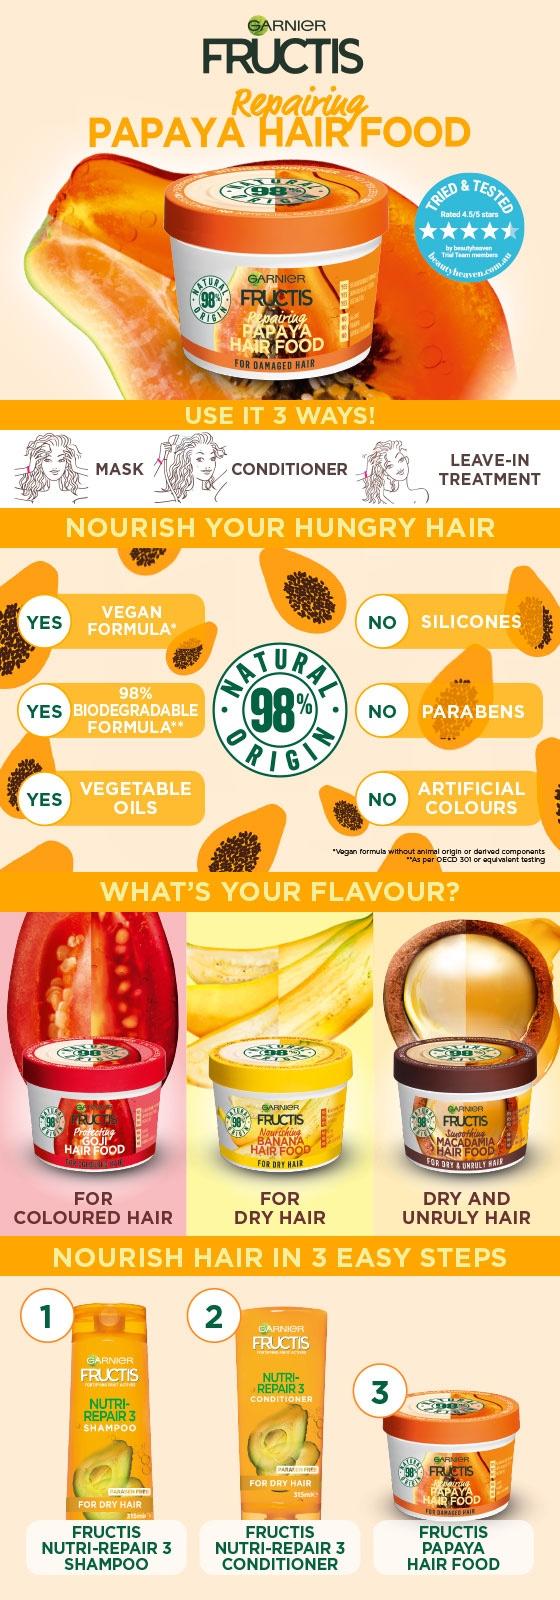 Garnier Fructis Repairing Papaya Hair Food